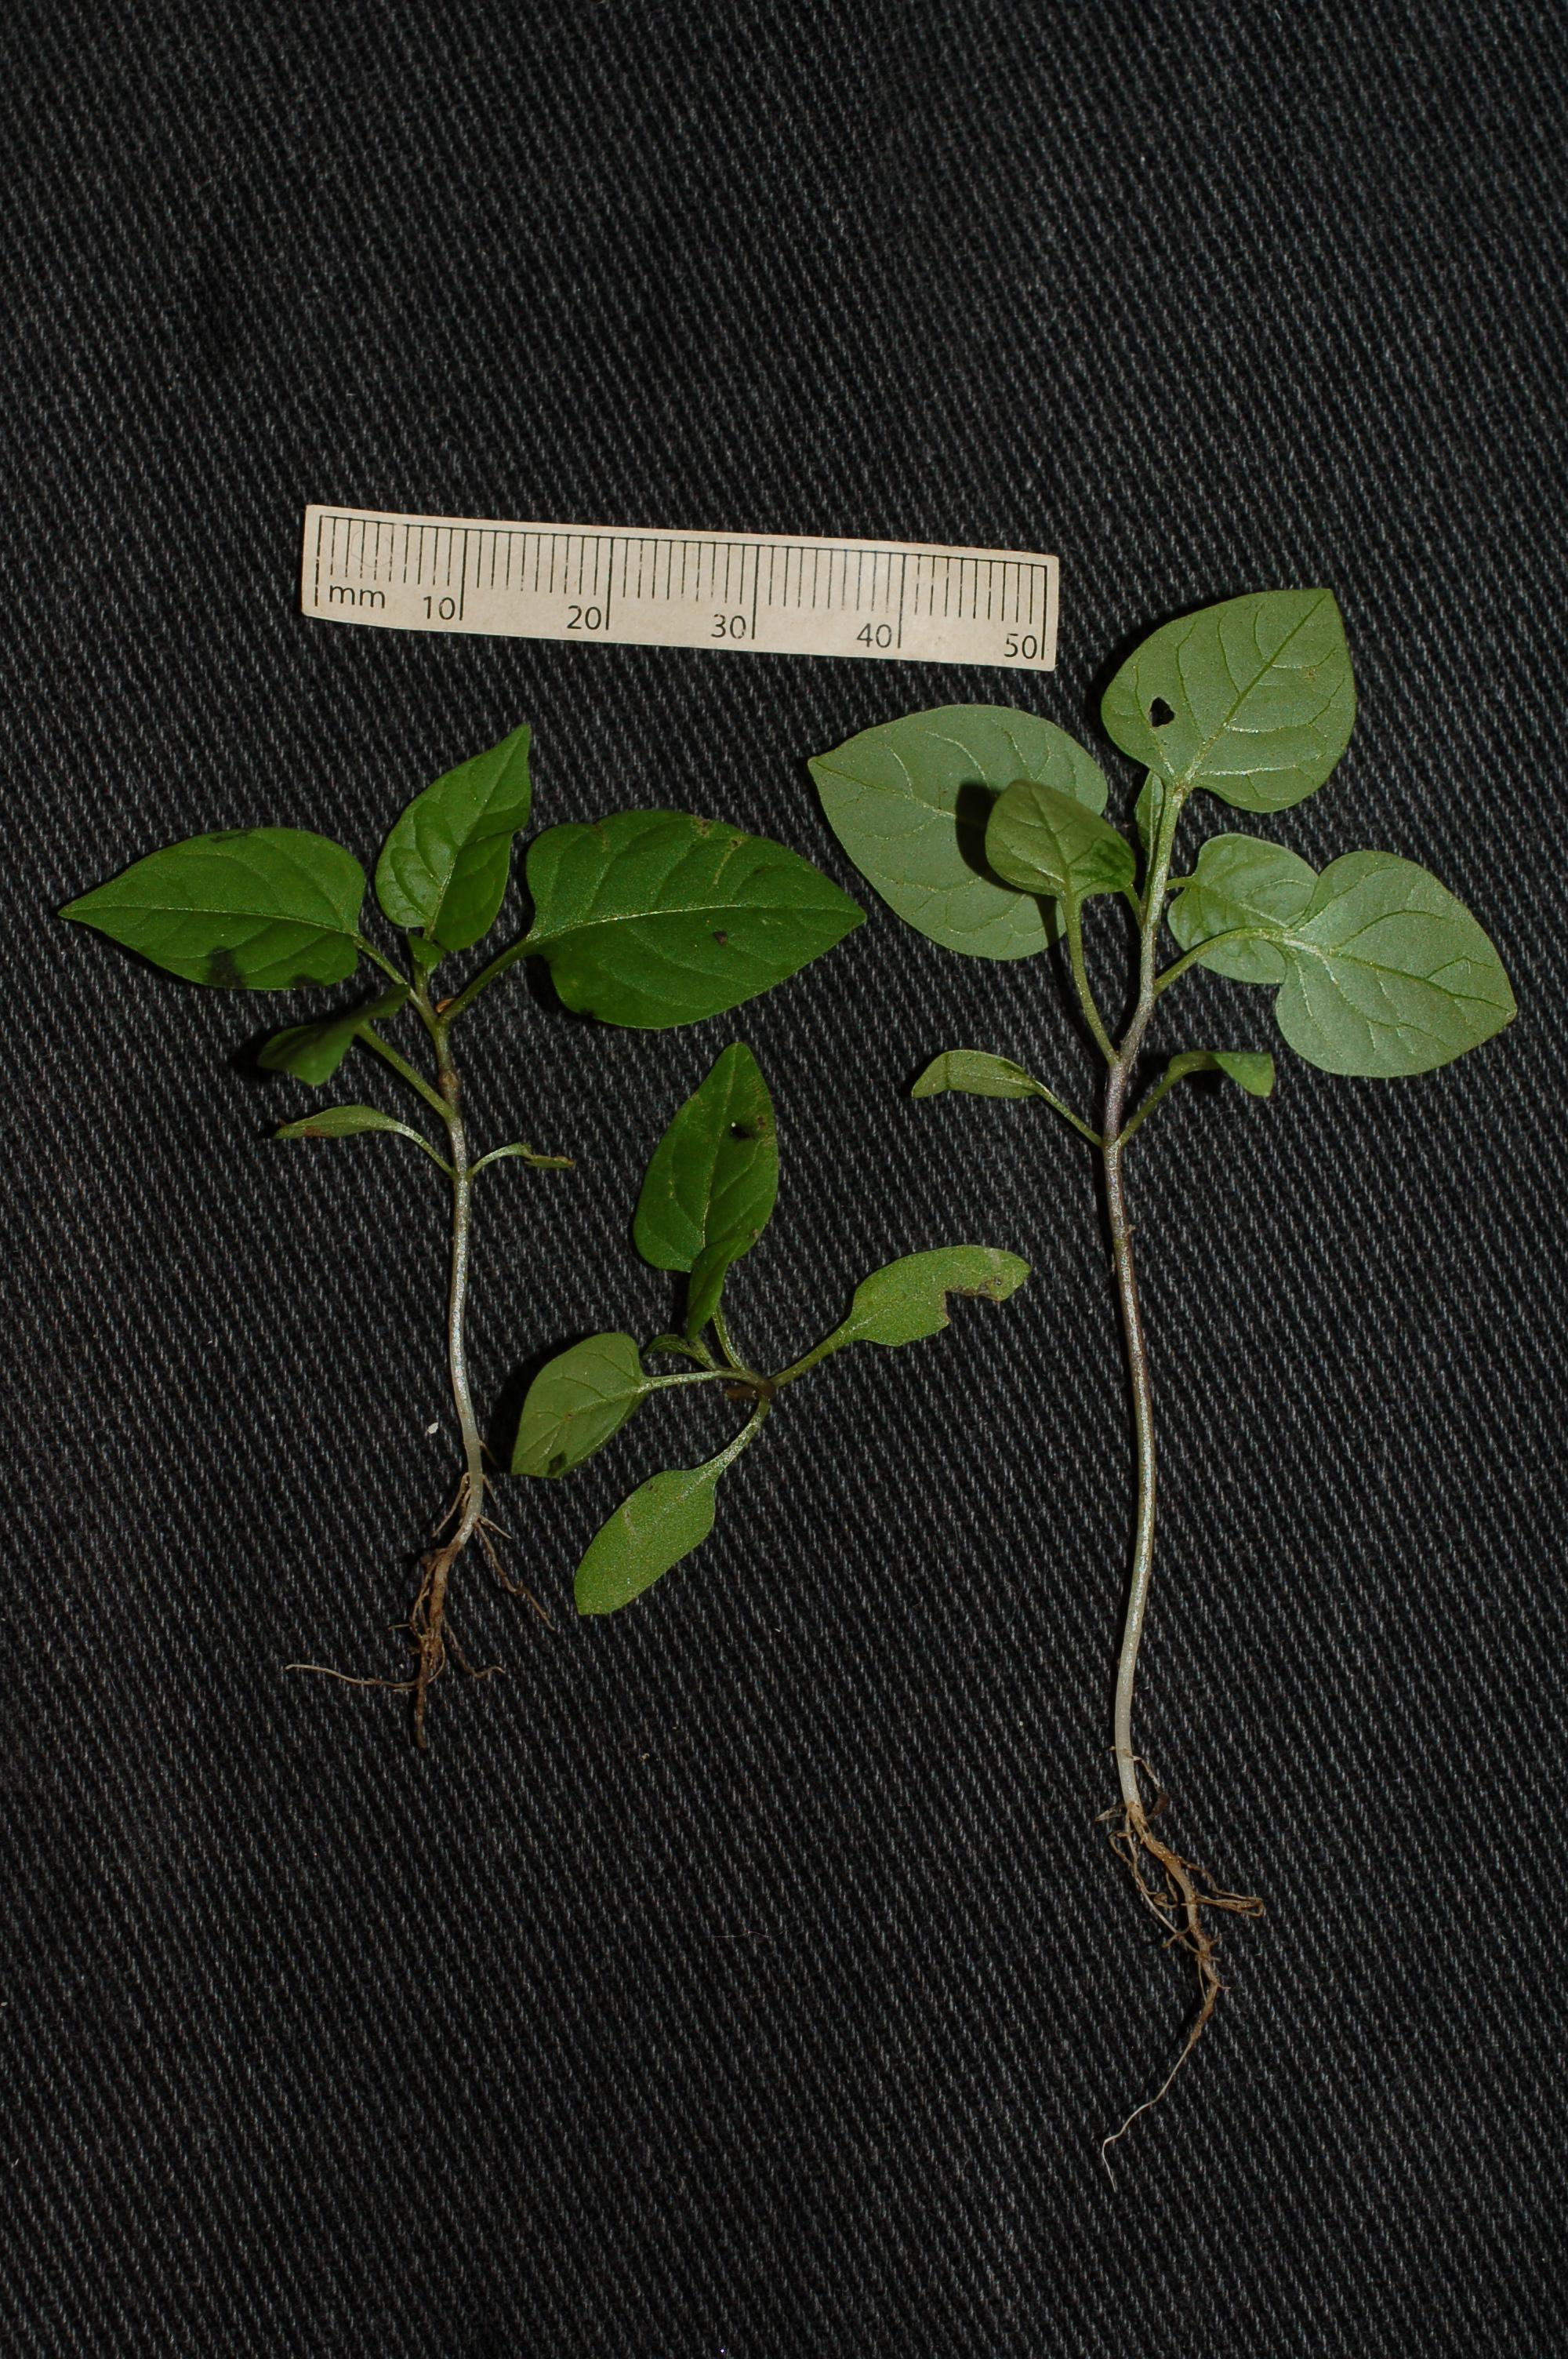 Solanum dulc seedling 1